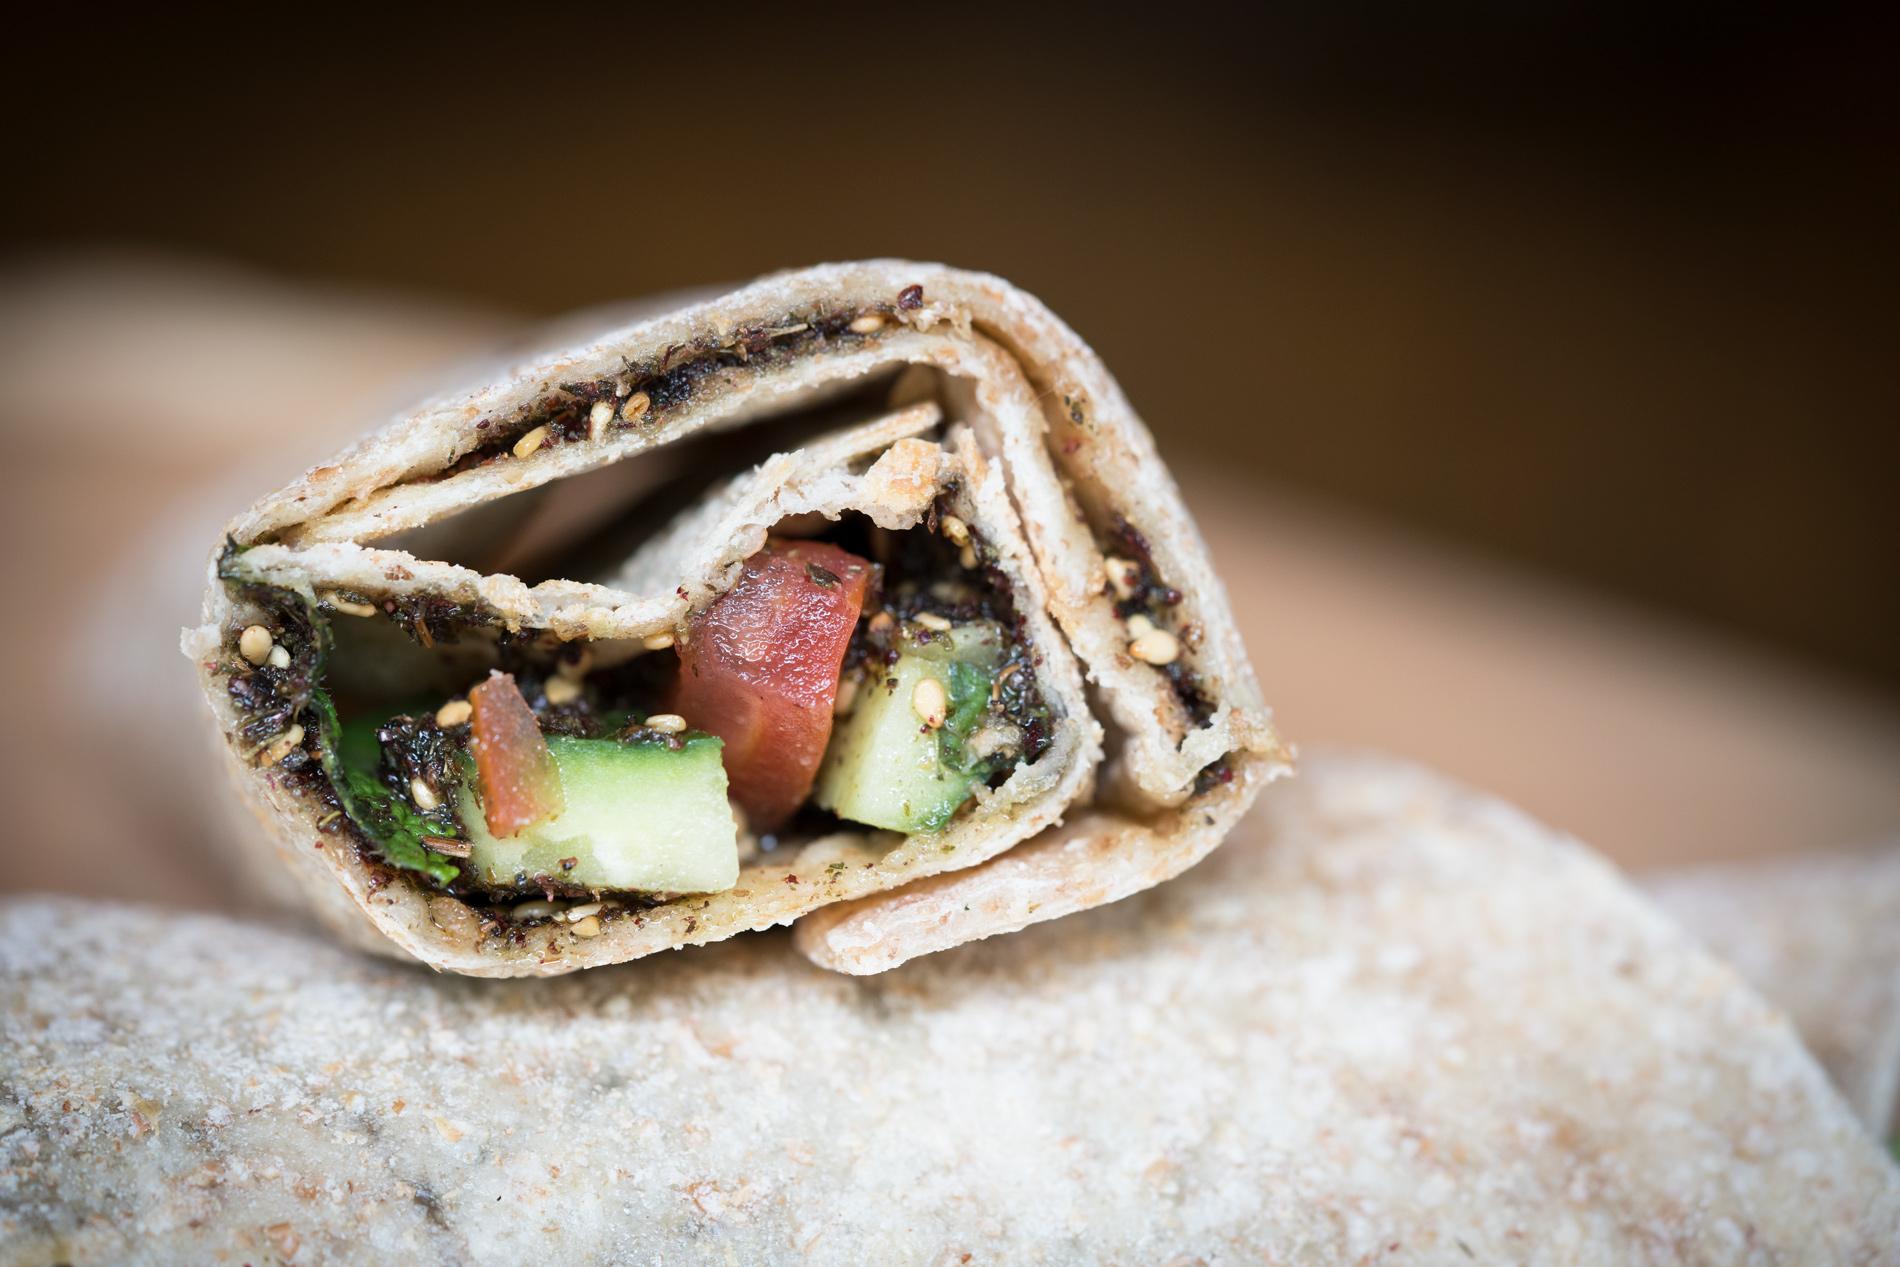 Makan, auténtica street food libanesa en Madrid